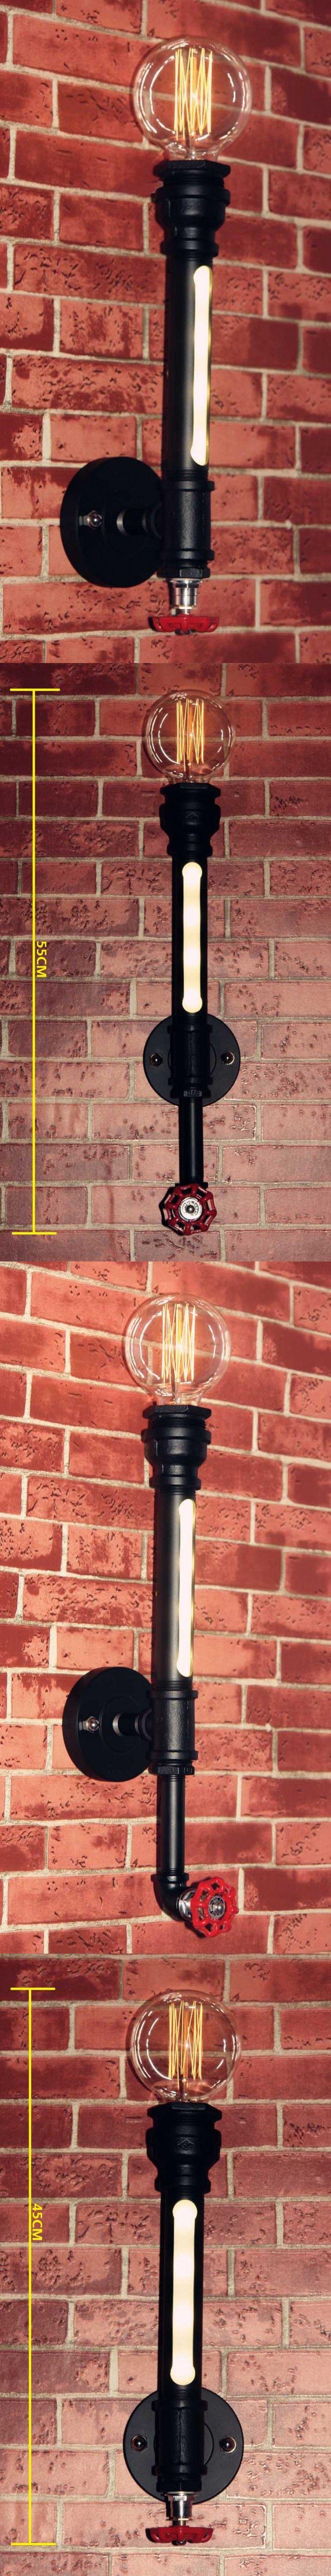 a0728285b62f105d1a276edfd3360d1c--bar-home-wall-lamps Wunderbar Led Lampen E14 Warmweiß Dekorationen